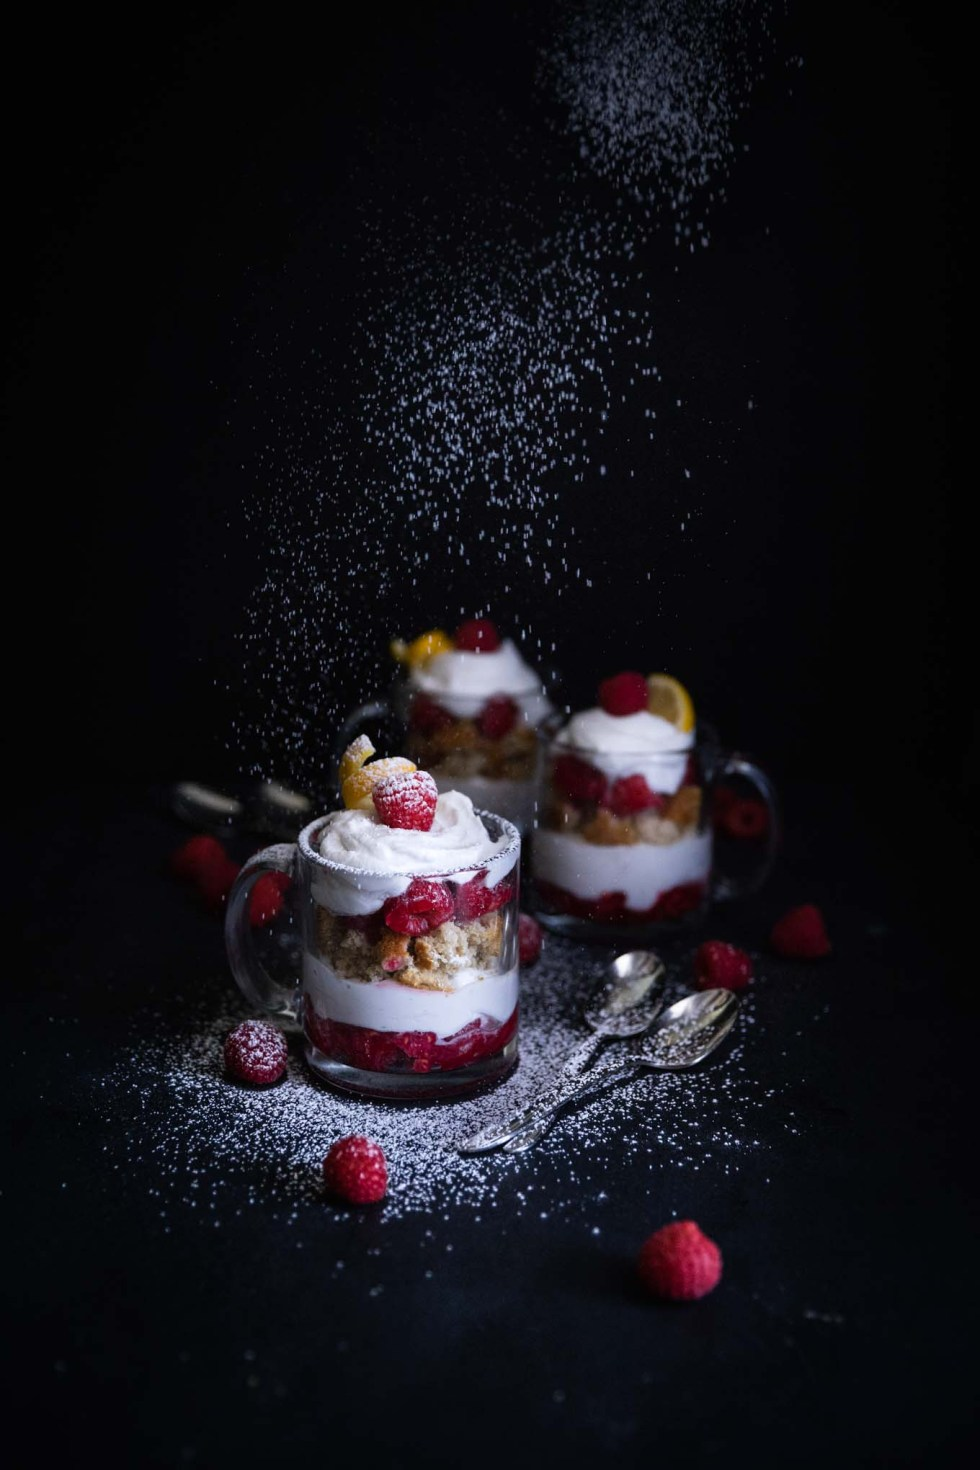 Dusting Raspberry Lemon Cake Trifles with powdered sugar